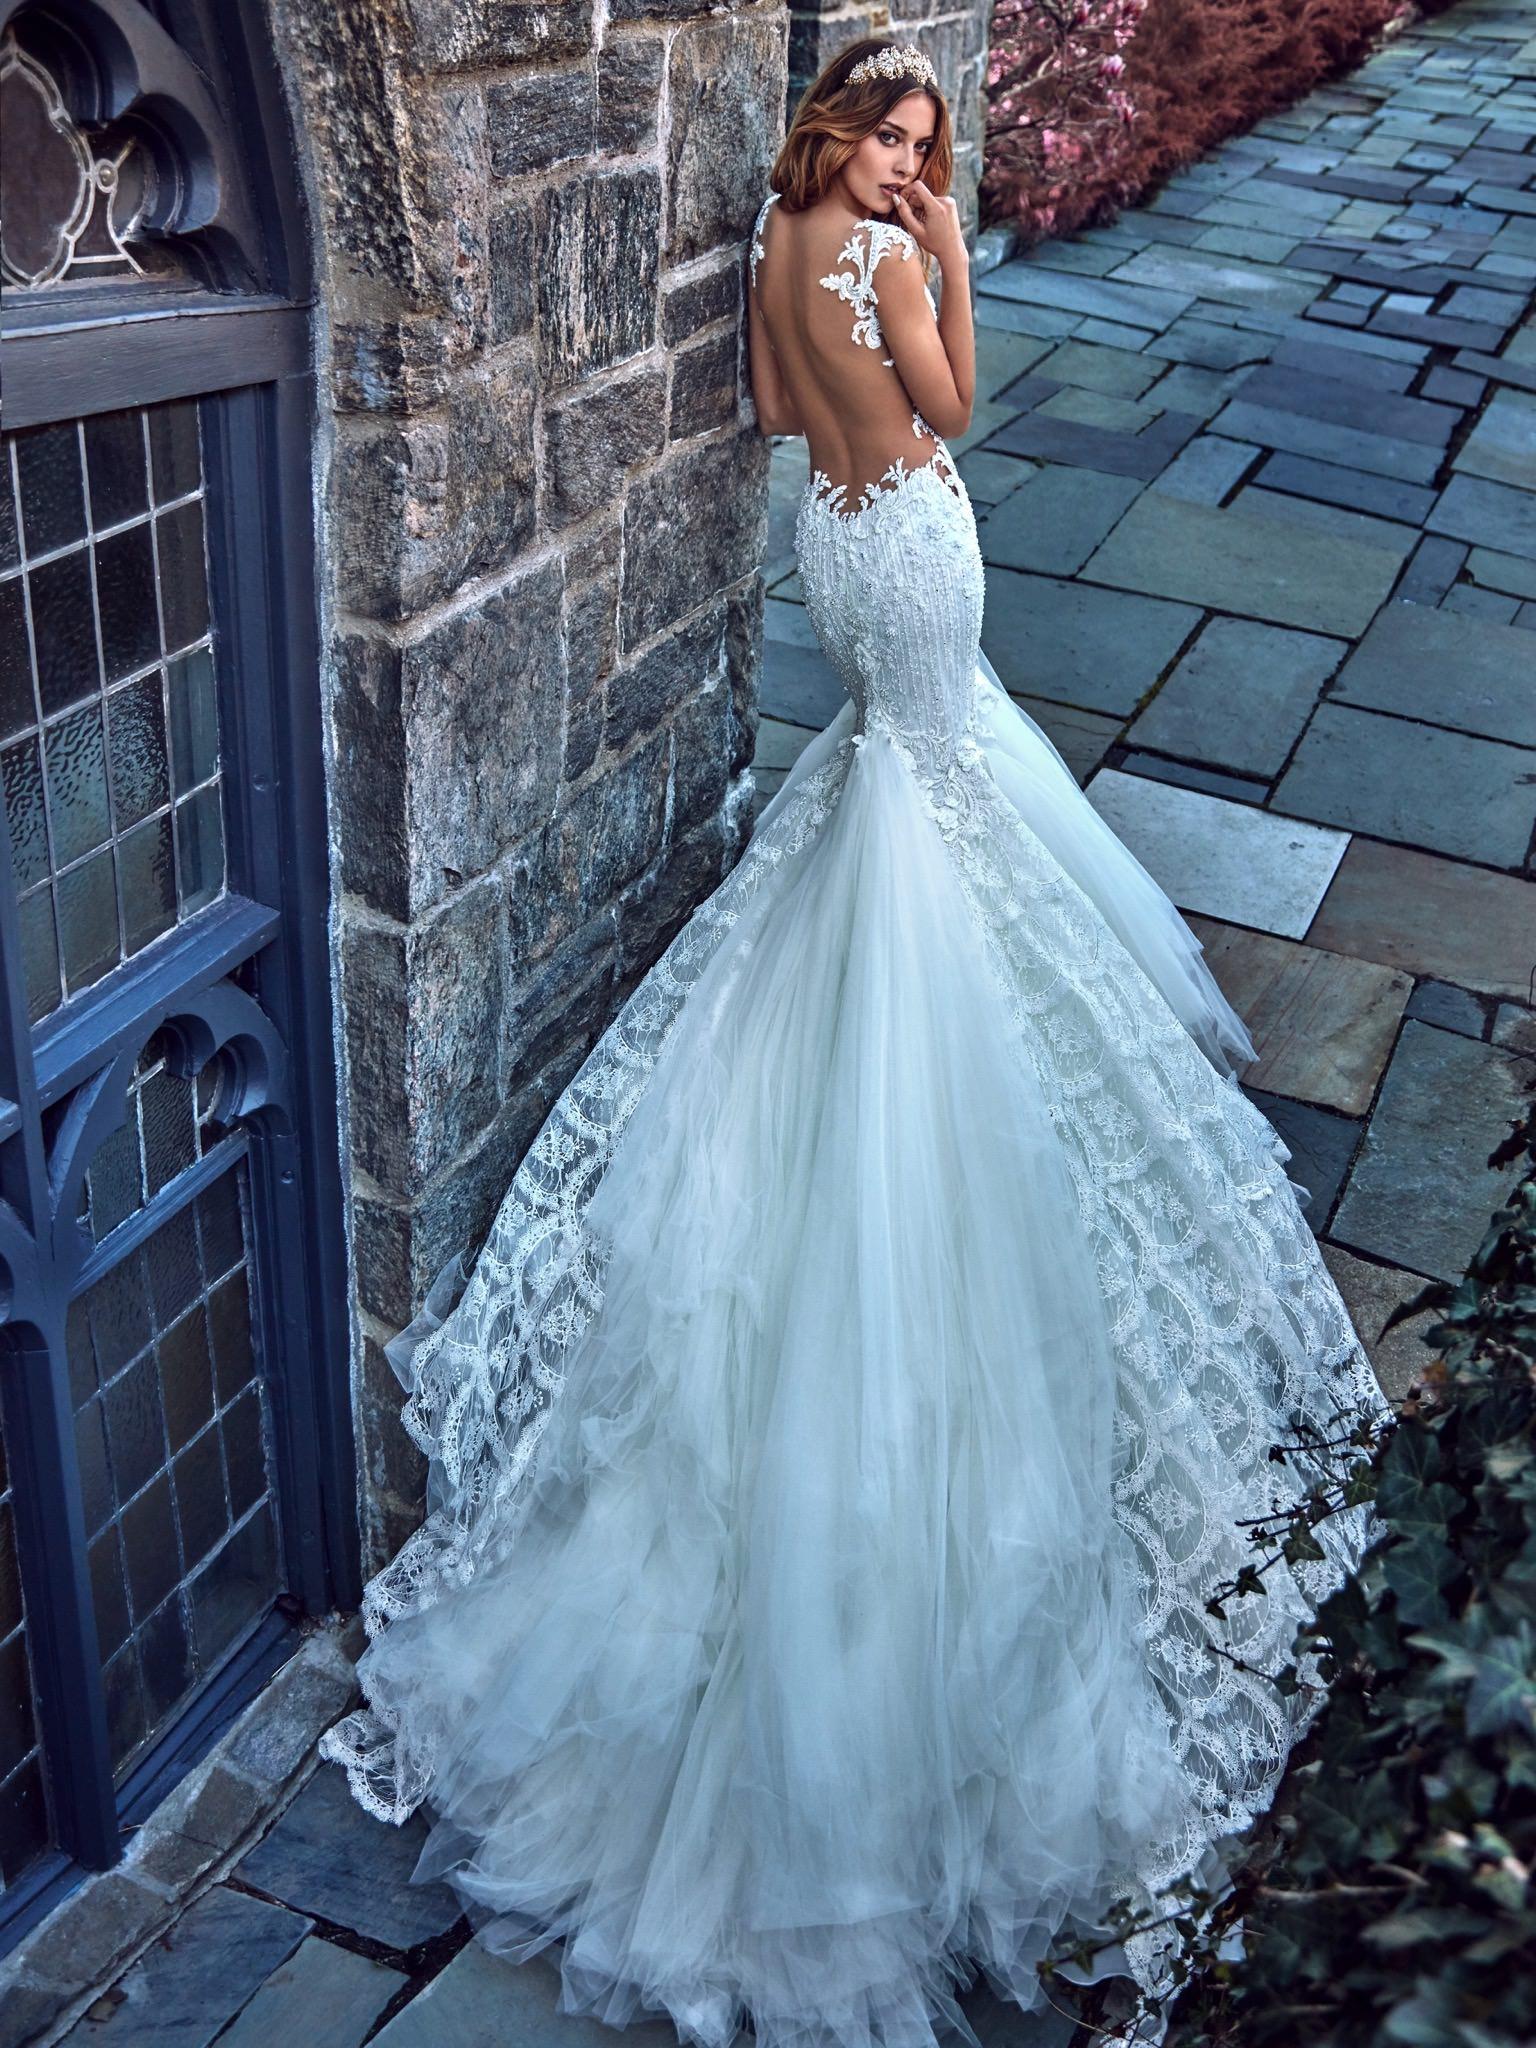 Wedding Dress sale Archives - Browns Bride